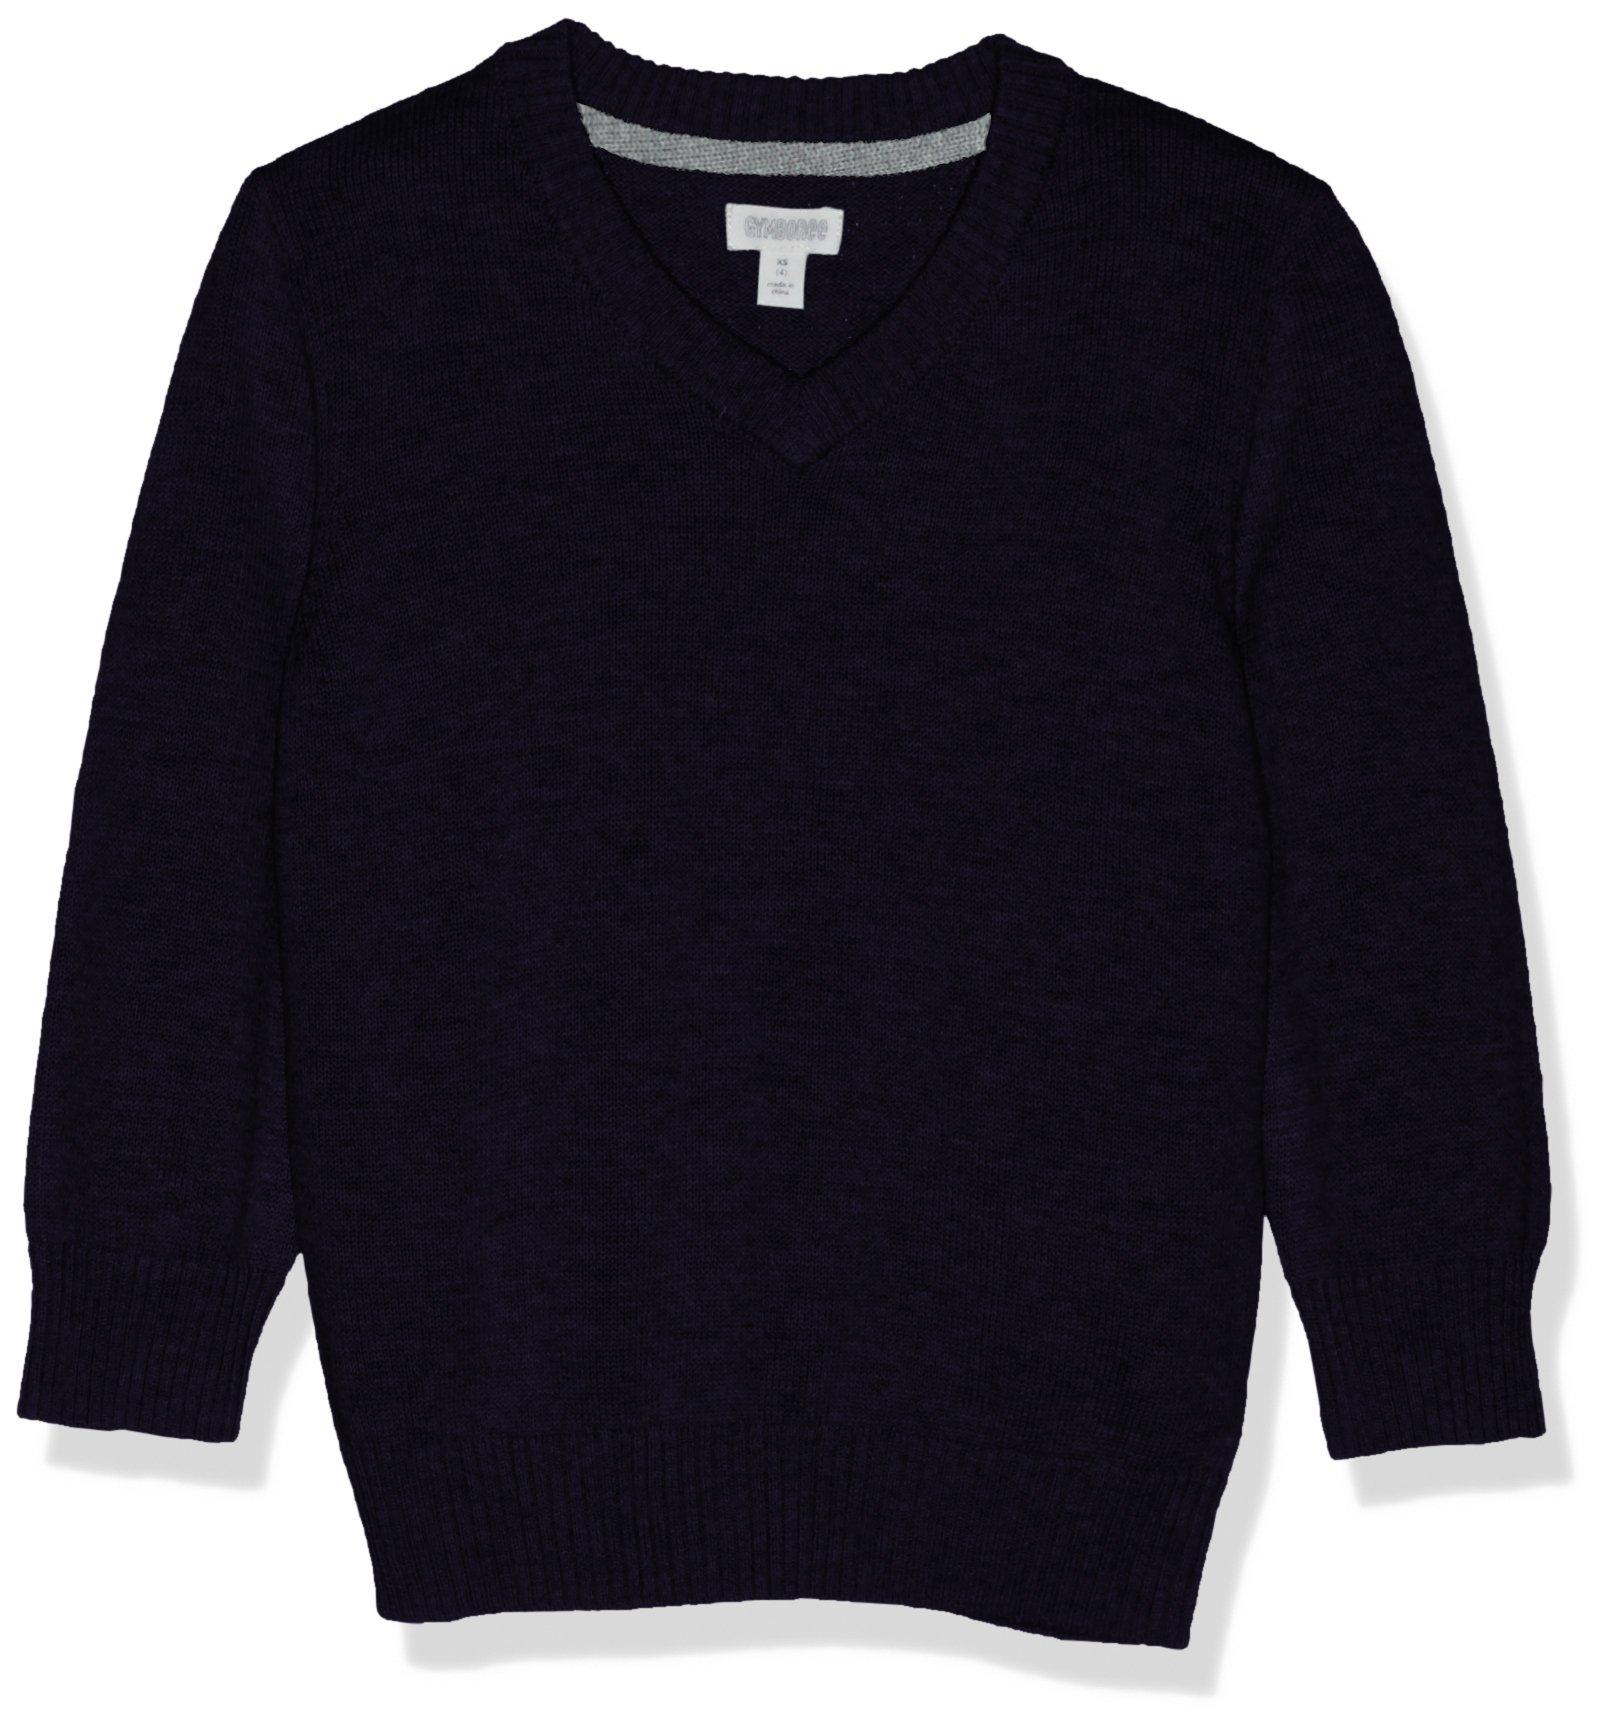 Gymboree Boys' Big Long Sleeve V-Neck Uniform Sweater, Navy, XS